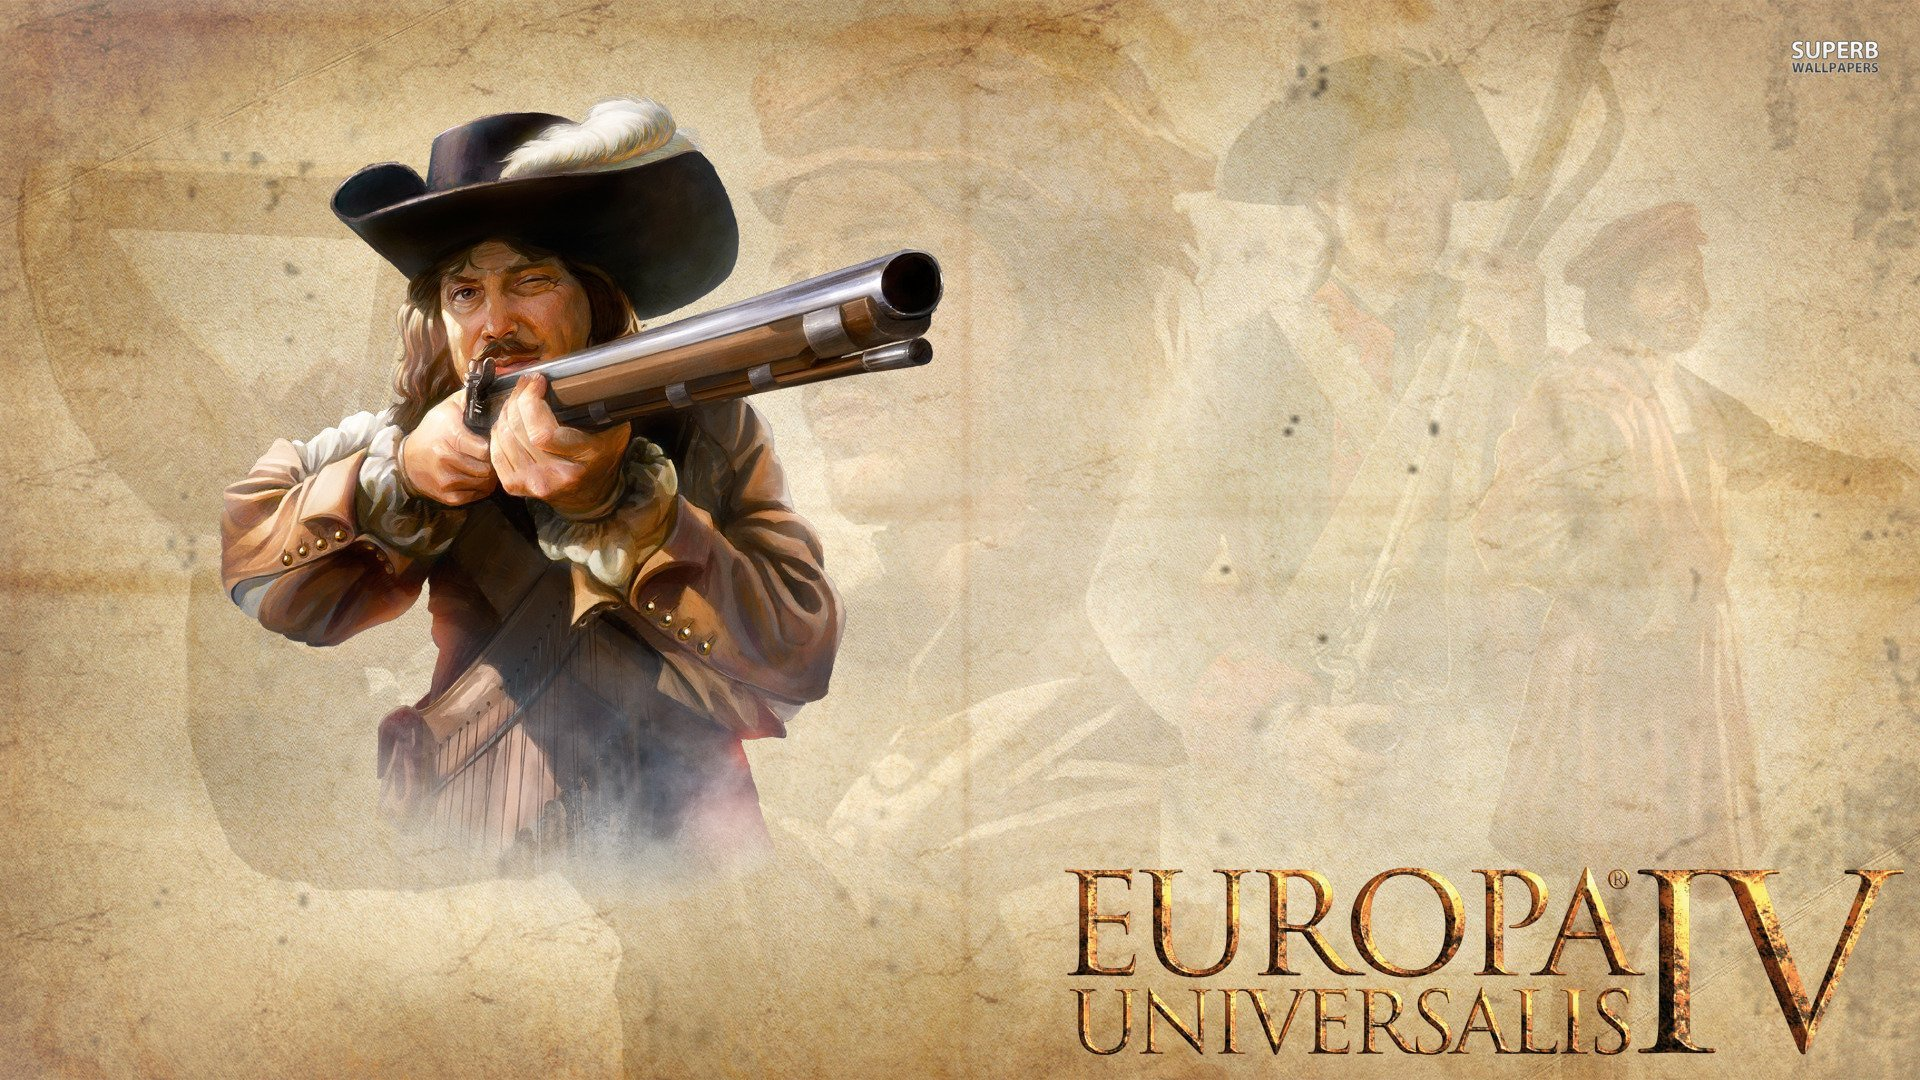 europa-universalis-iv-22916-1920x1080-jpg